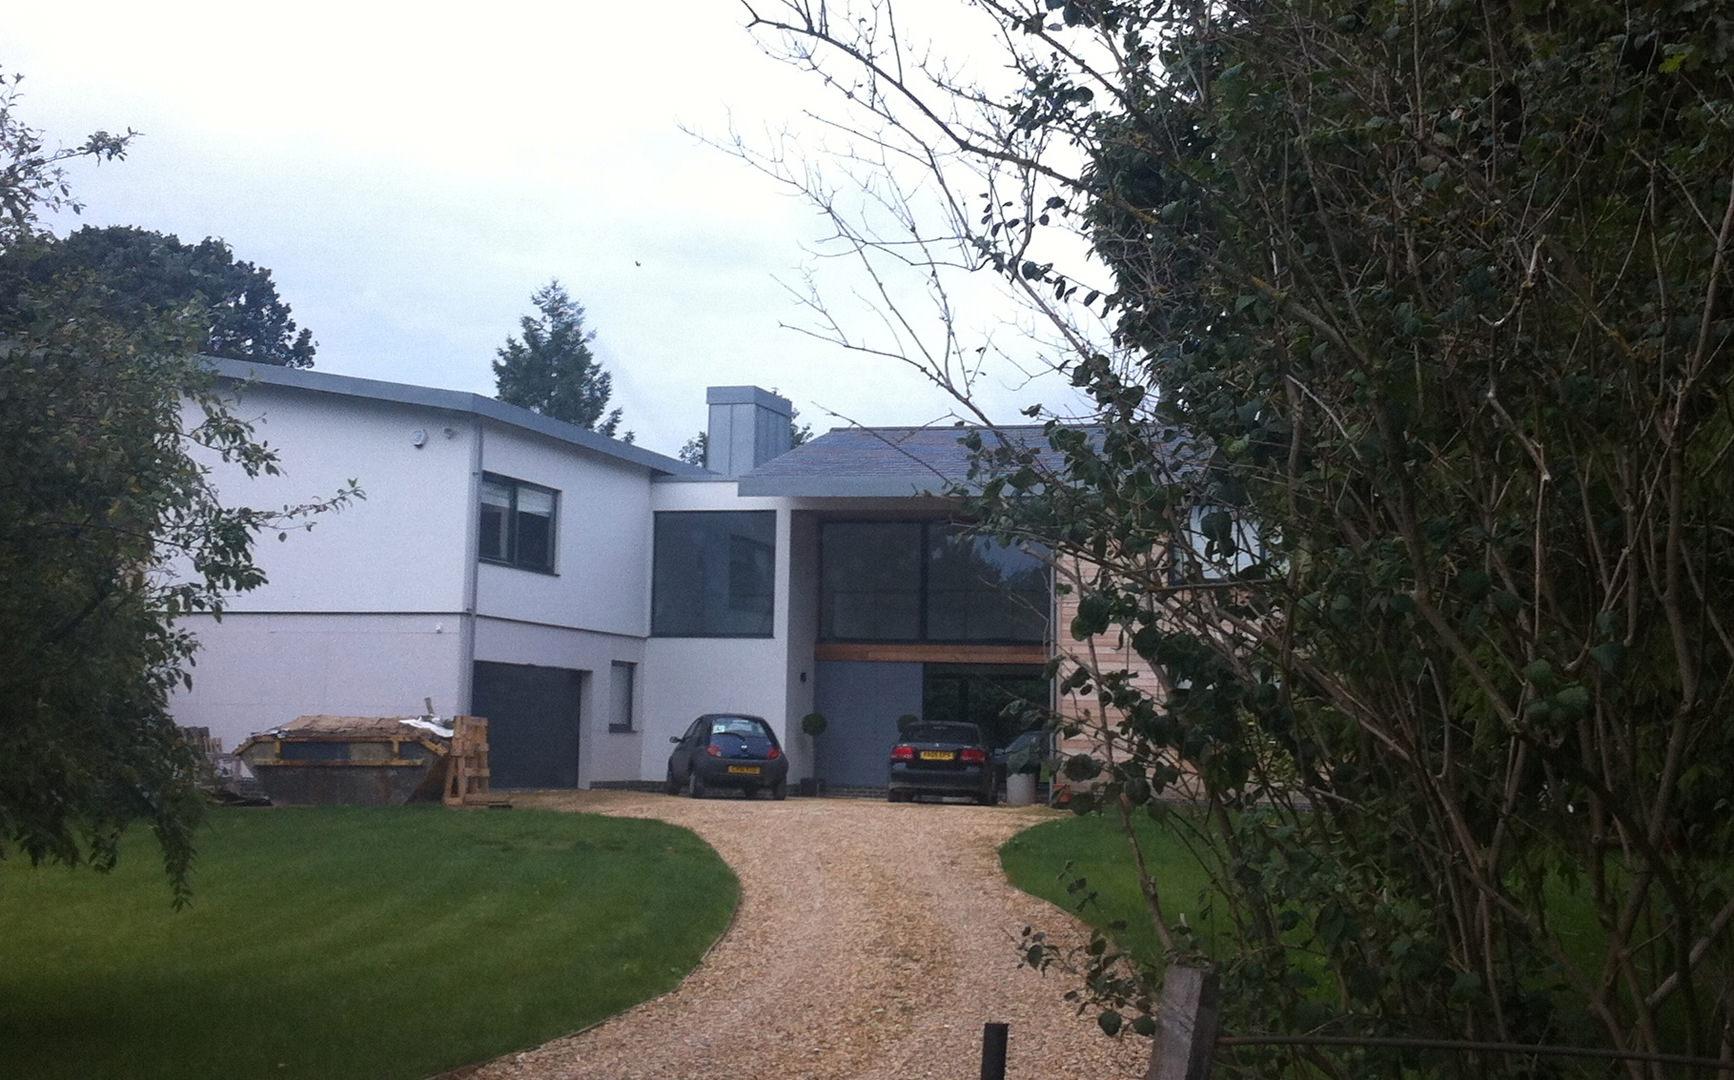 Campton House